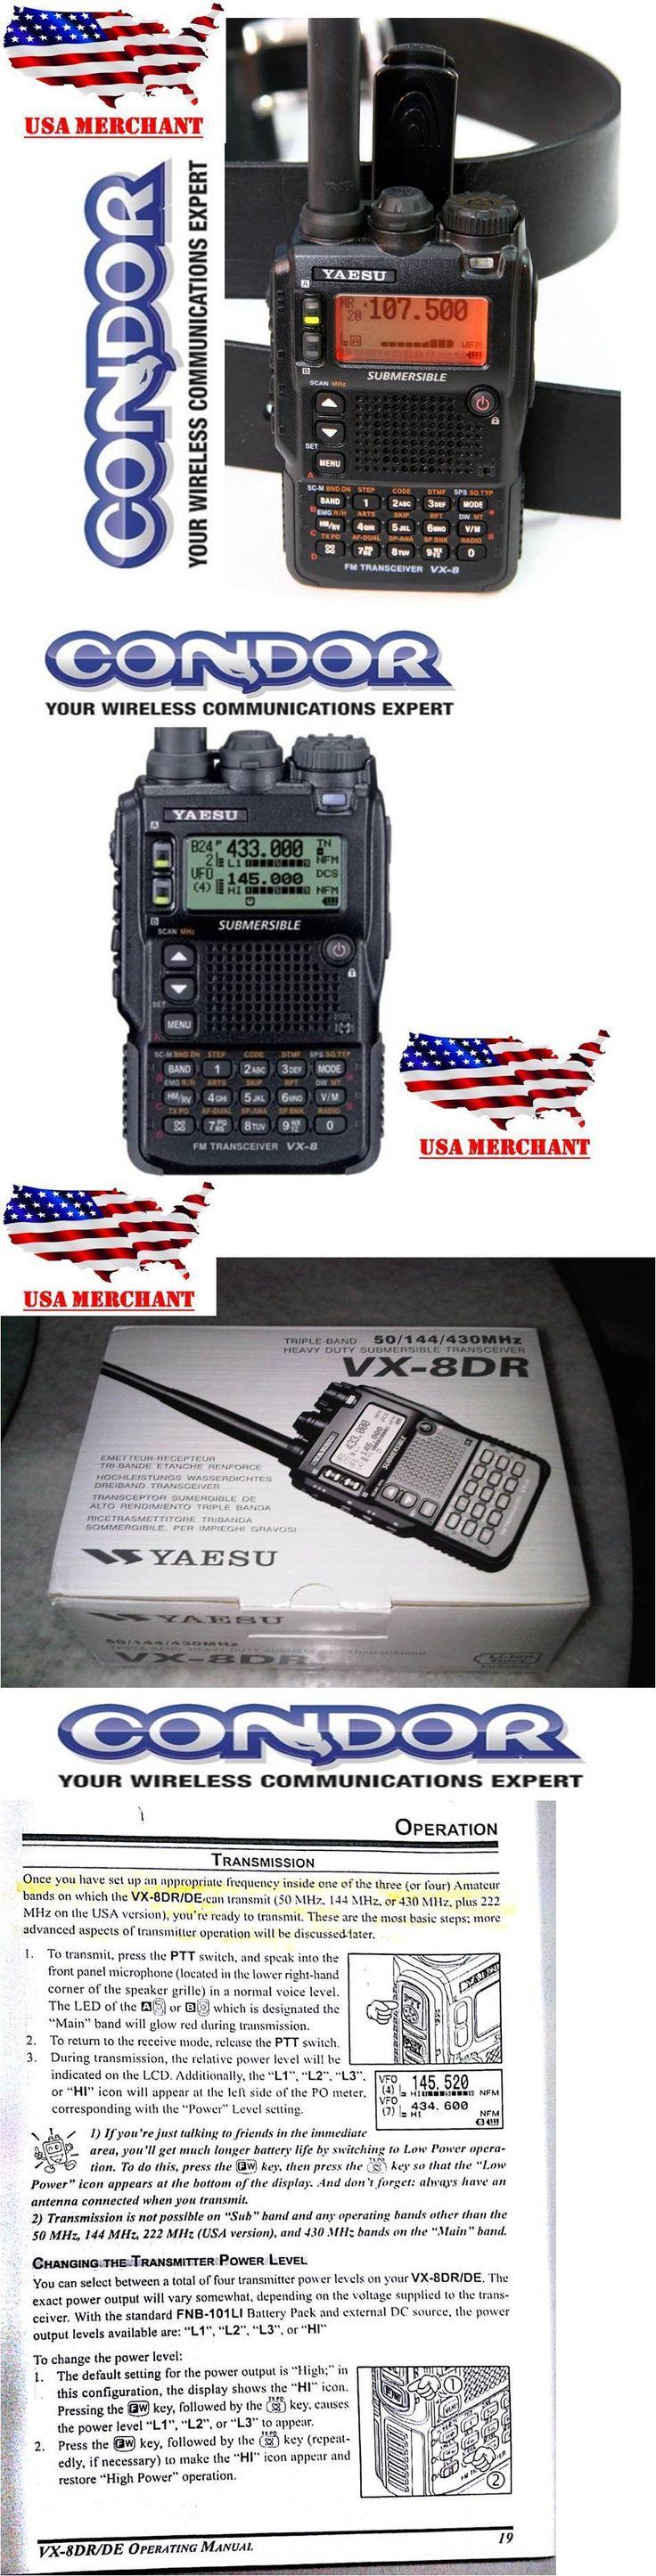 Ham Radio Transceivers: Yaesu Vx-8Dr Handheld Ham Radio Quad-Band Submersible 6M/2M/222/440 Am, Cw, Fm, -> BUY IT NOW ONLY: $375.99 on eBay!